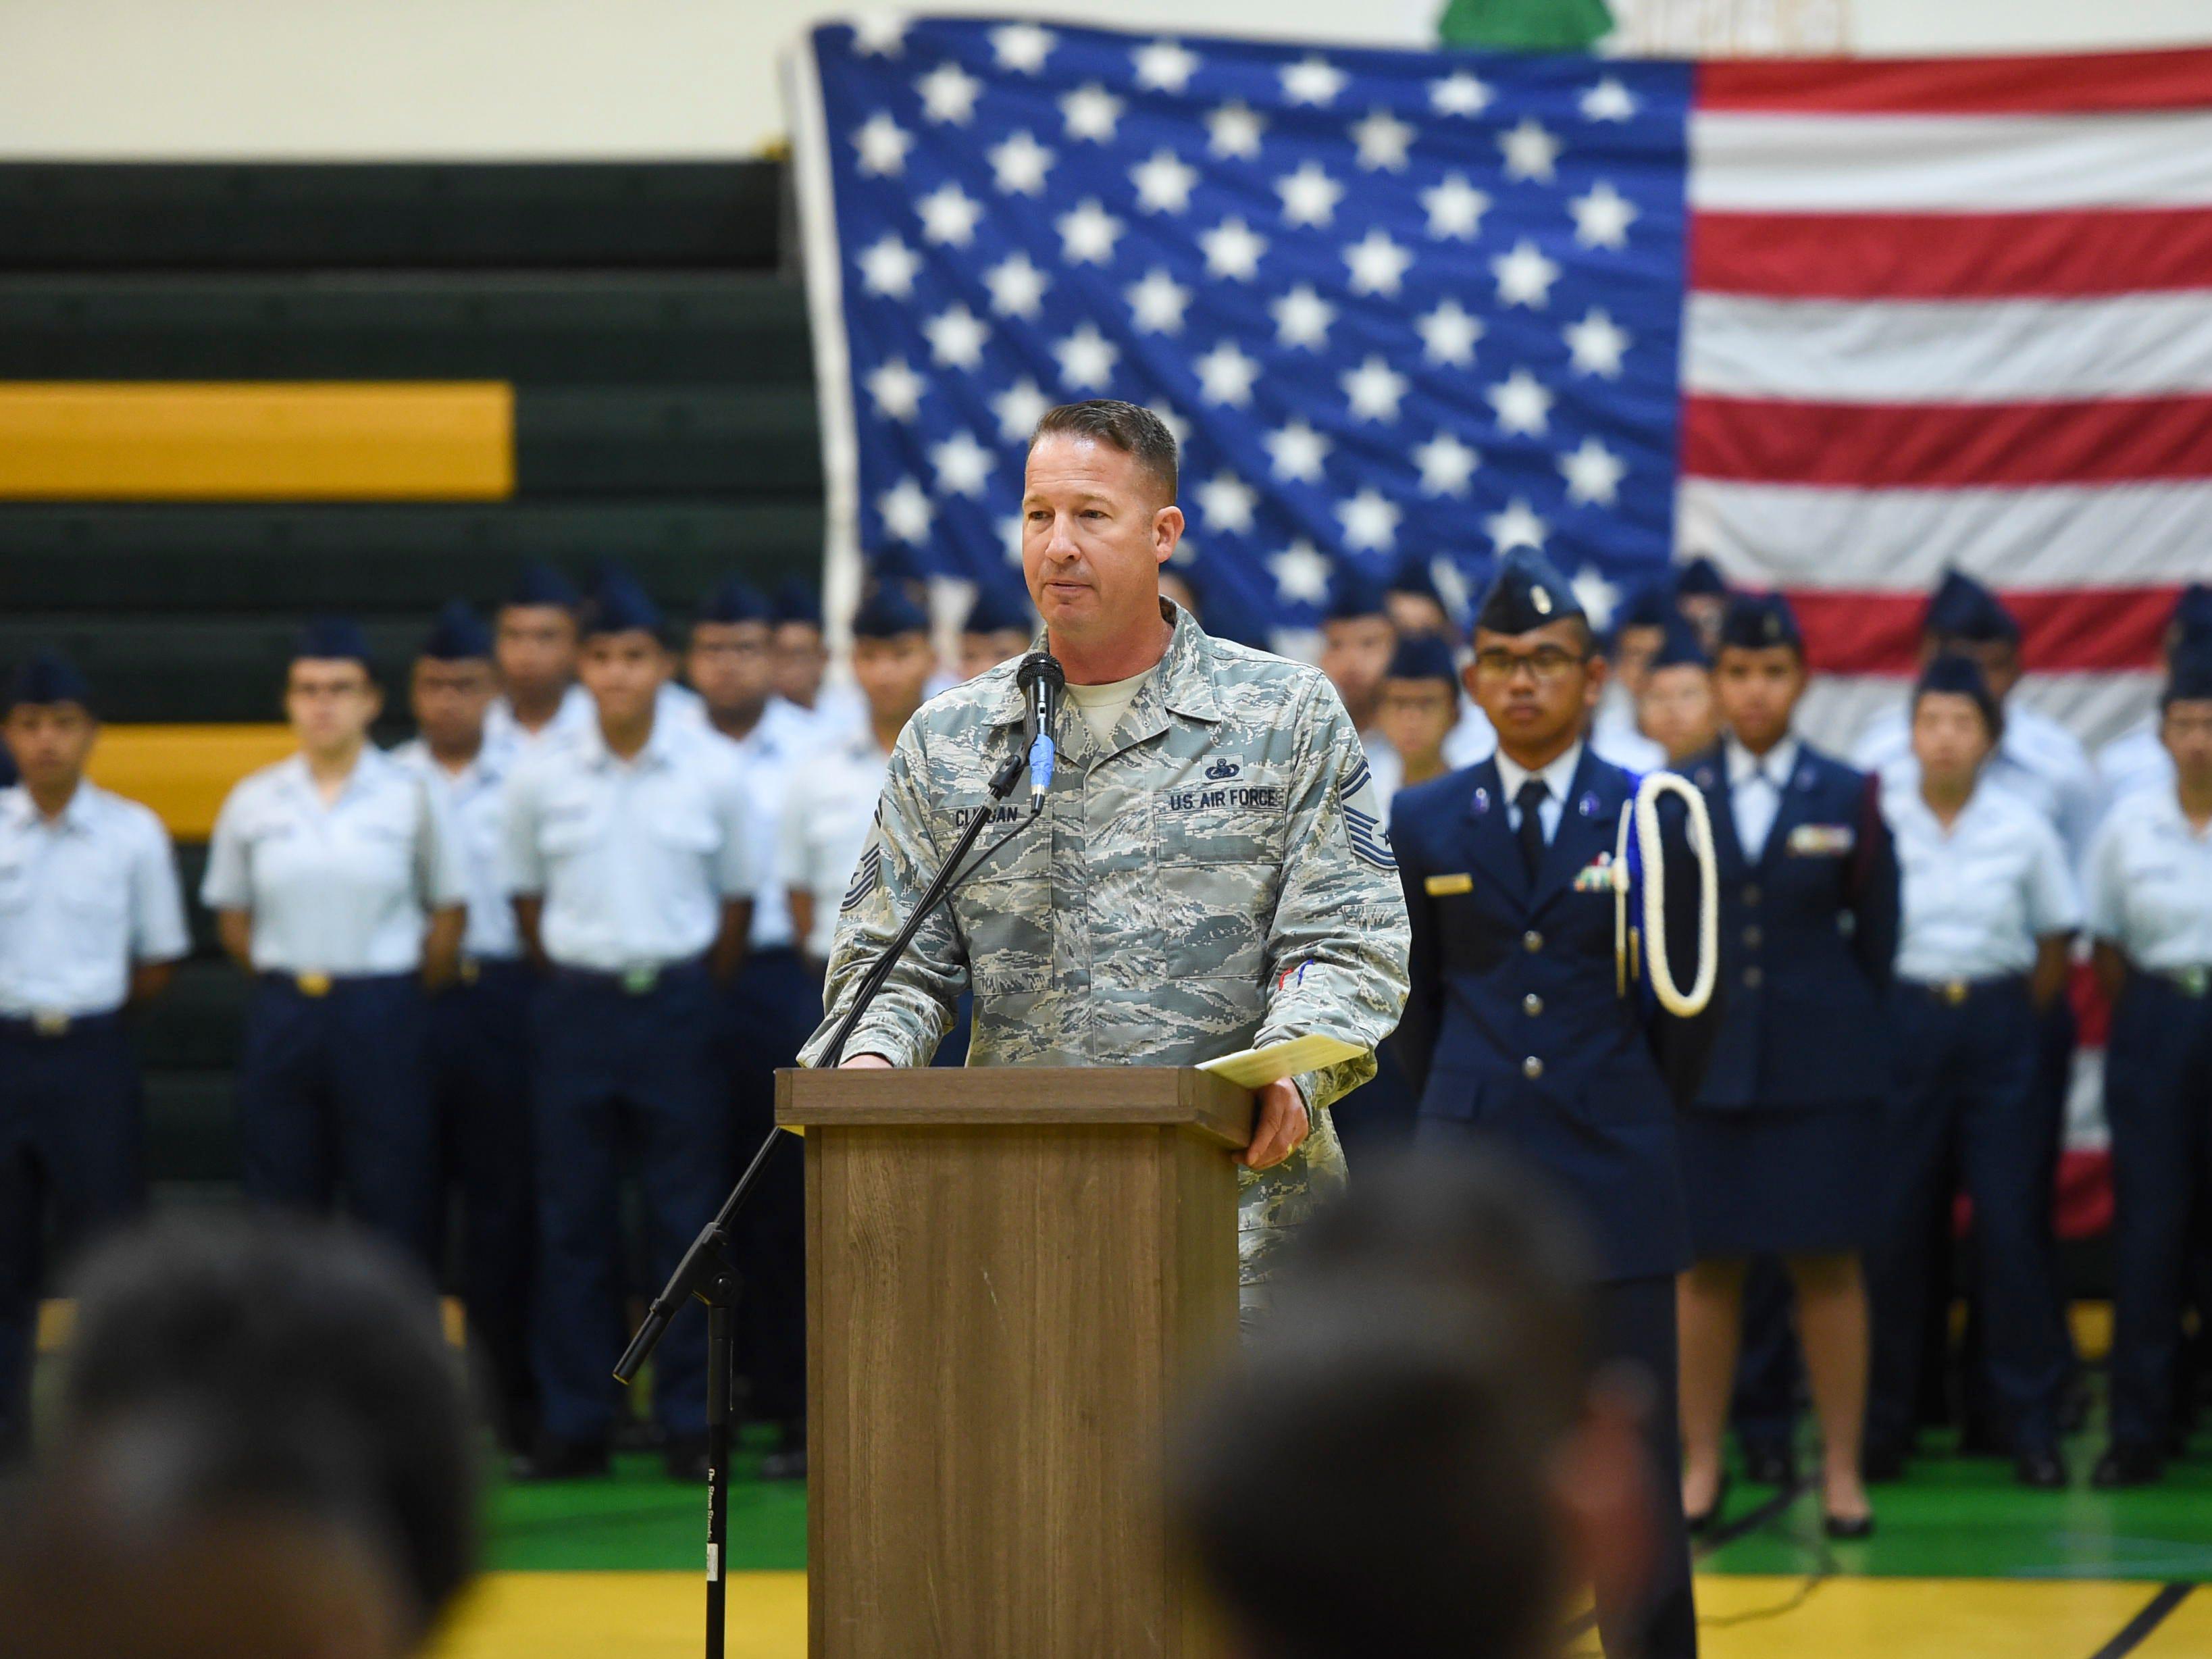 Senior Master Sgt. Adam Clingan speaks during the JFK High School Veterans Recognition Ceremony, Nov. 9, 2018.